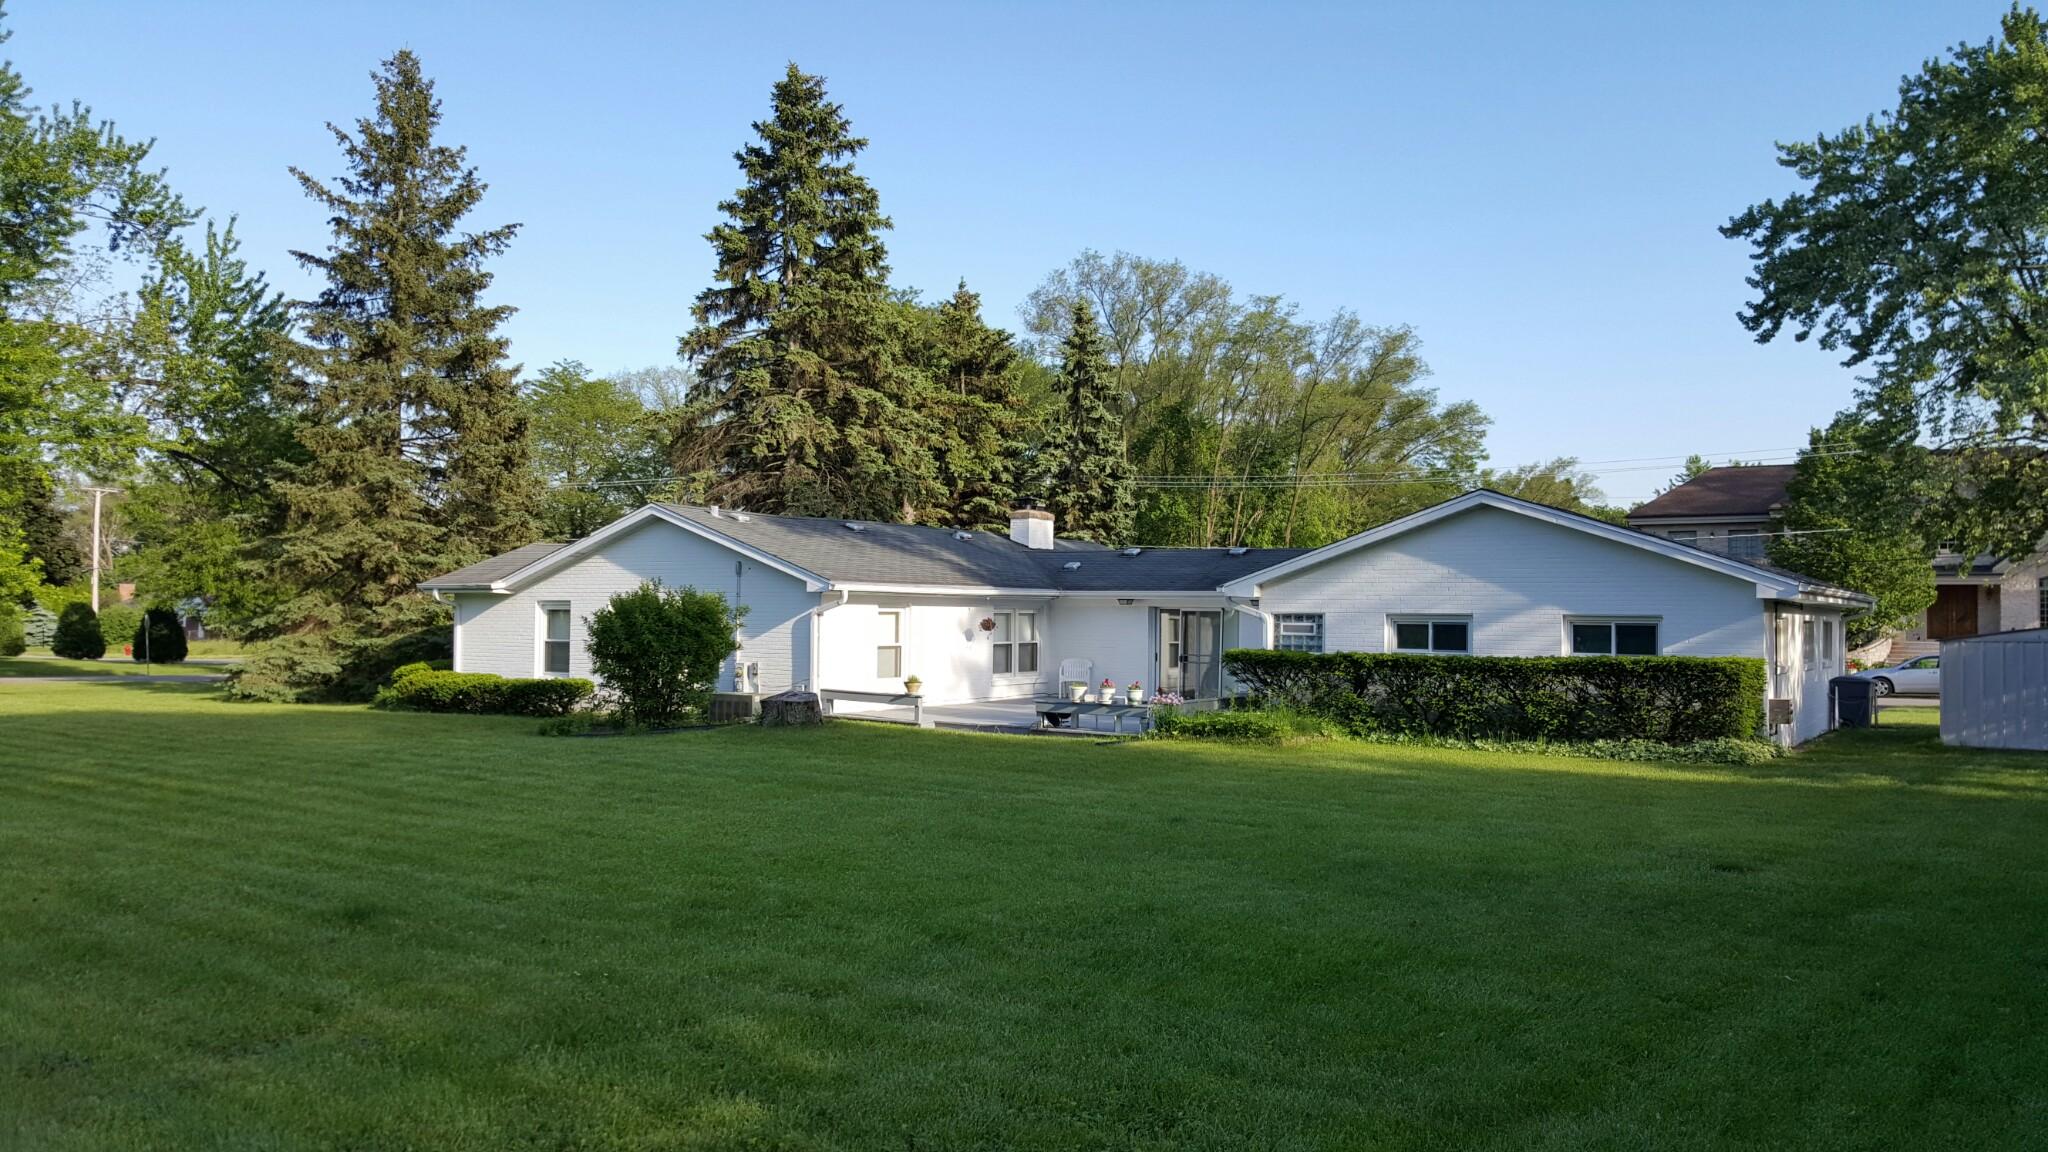 320 Hickory Ct, Northbrook, IL 60062 Exterior North Backyard